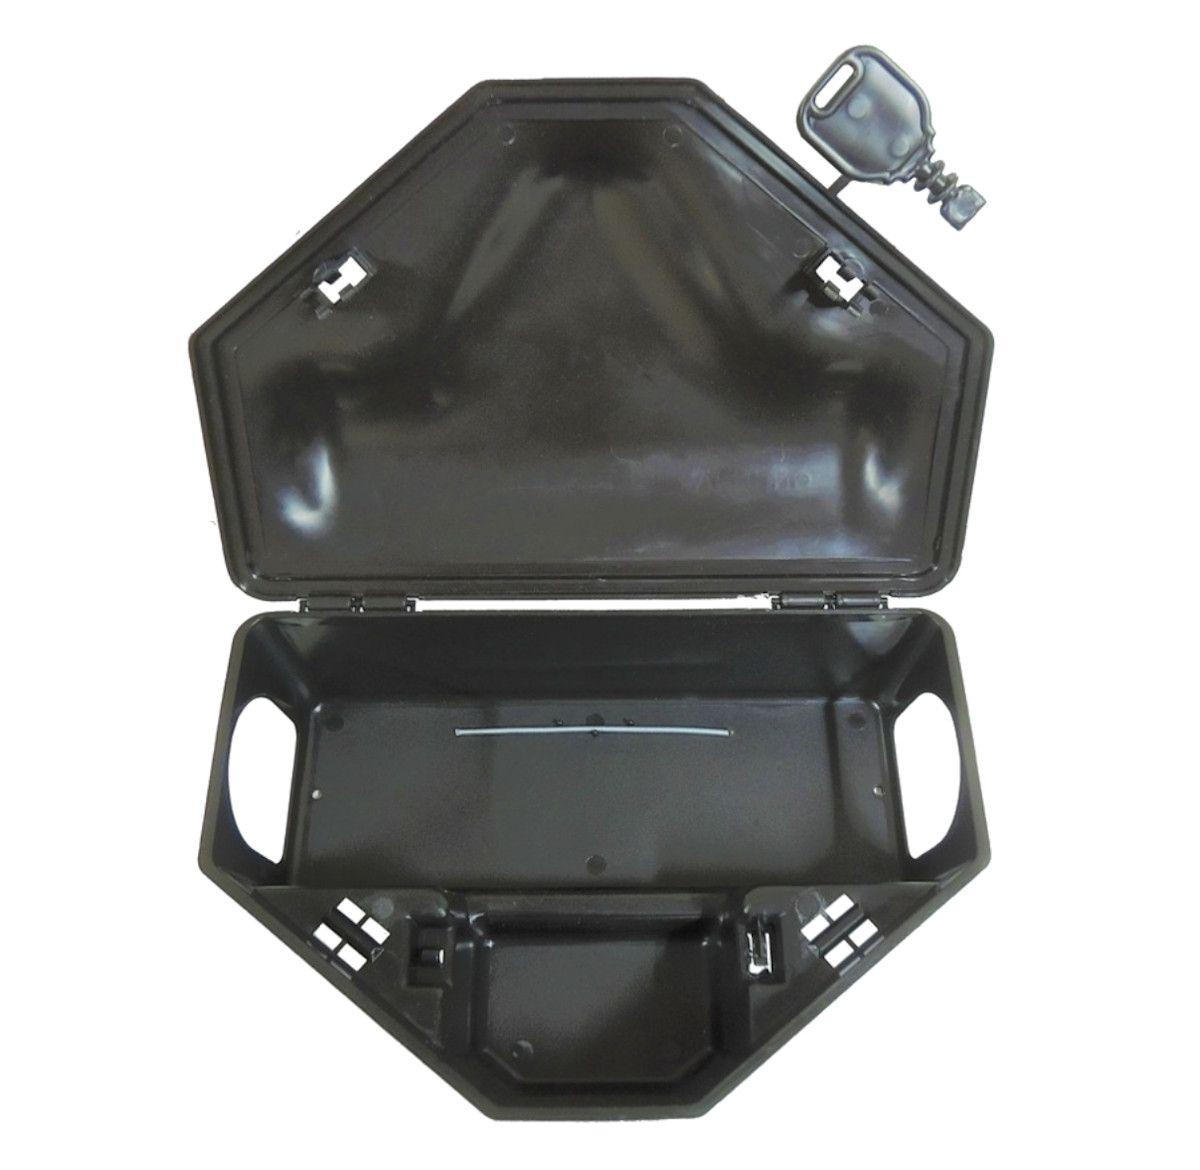 Kit 63 Porta Isca Com 2 Chaves - Duplo Travamento